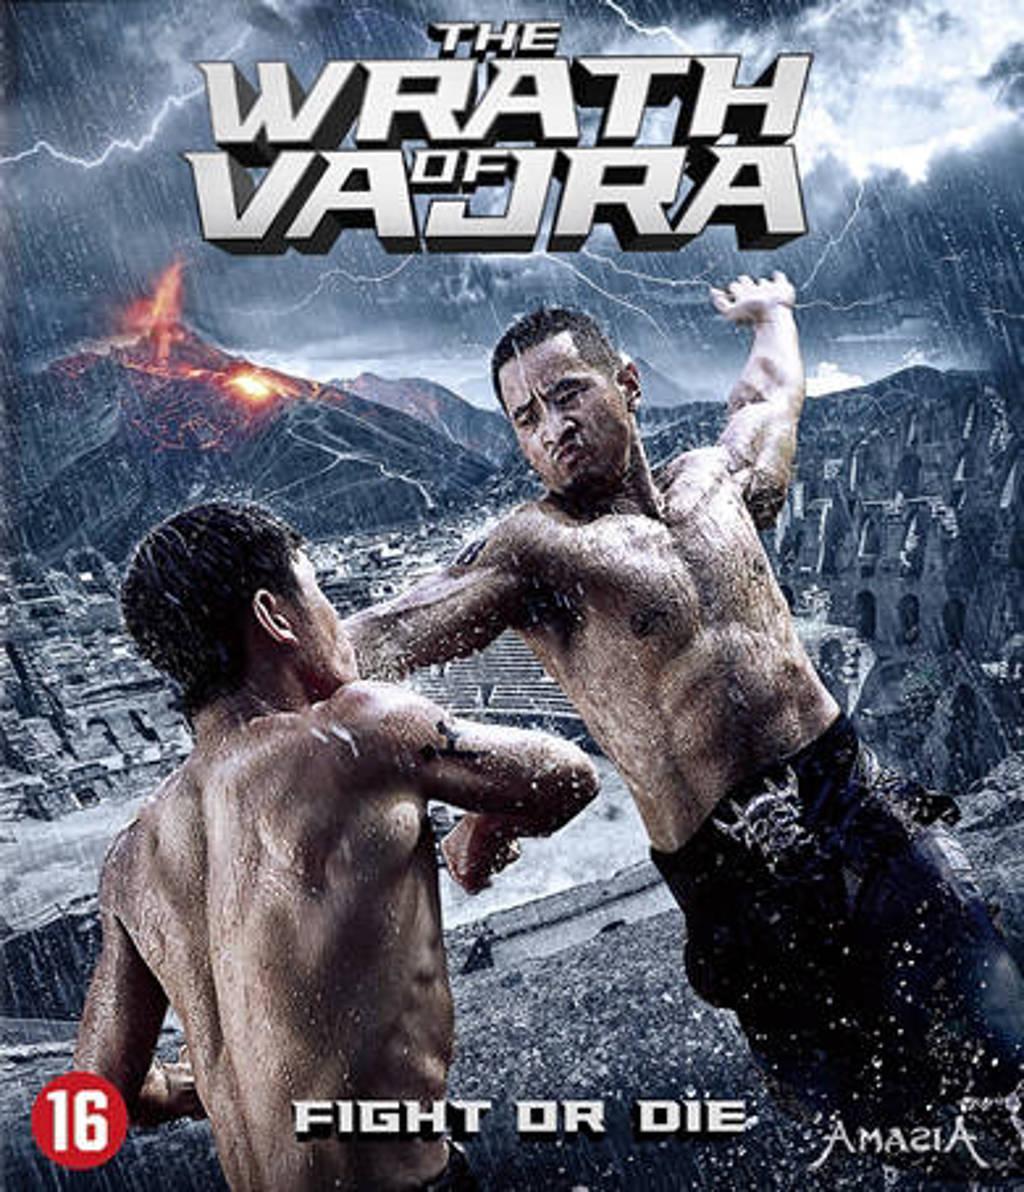 Wrath Of Vajra (Blu-ray)